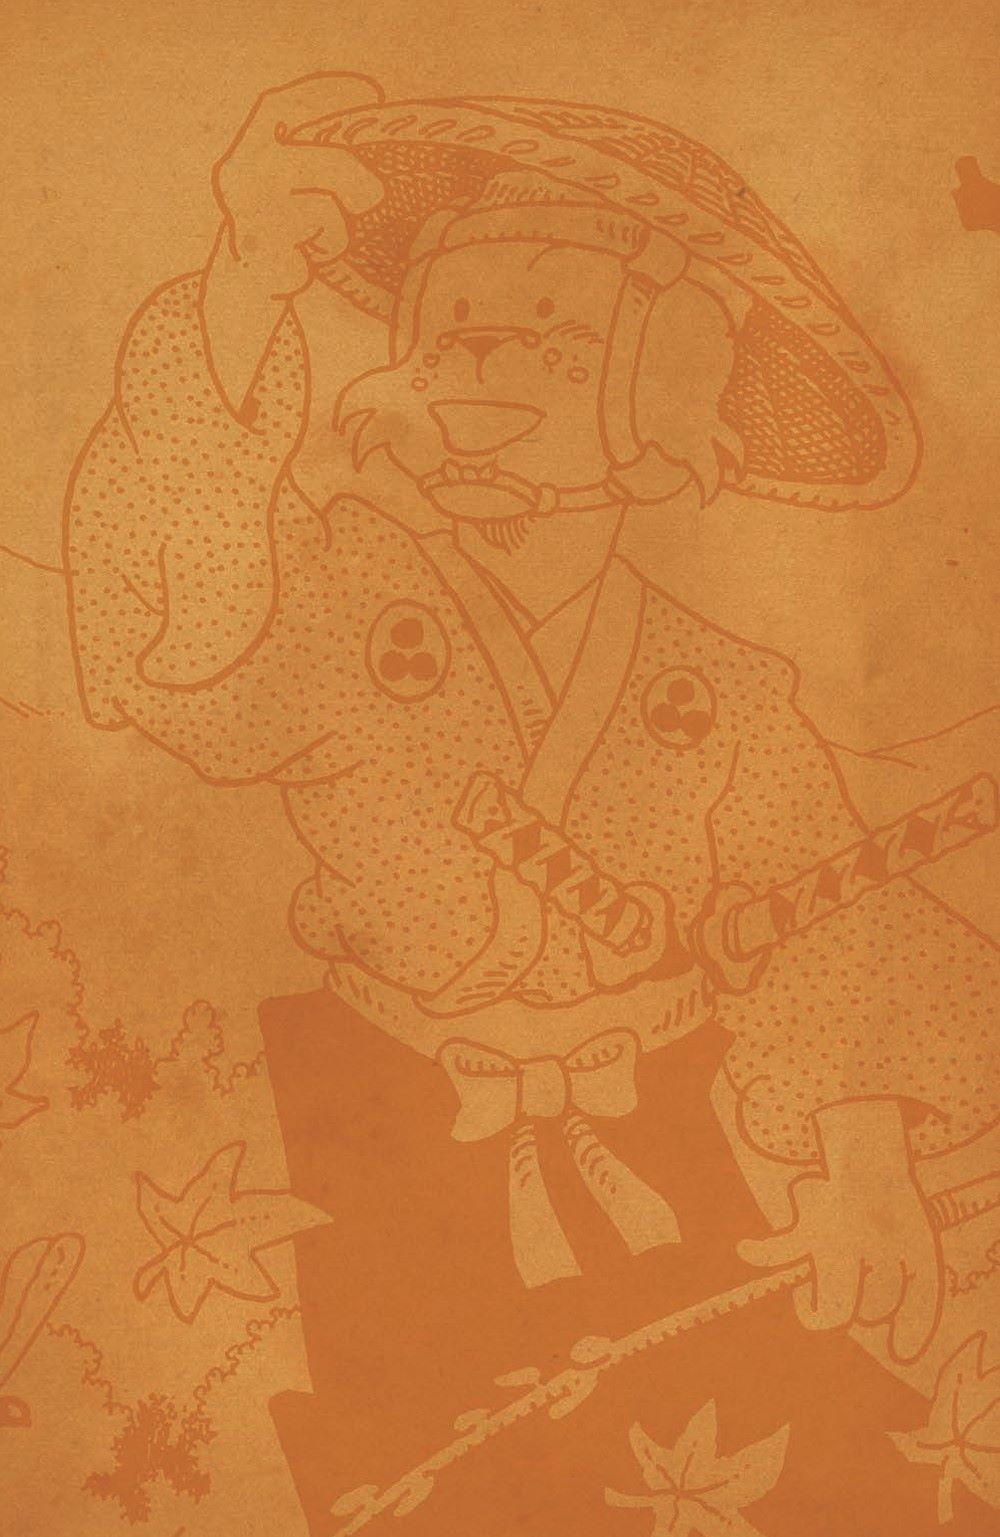 Usagi-Origins-v01-pr-7 ComicList Previews: USAGI YOJIMBO ORIGINS VOLUME 1 SAMURAI TP